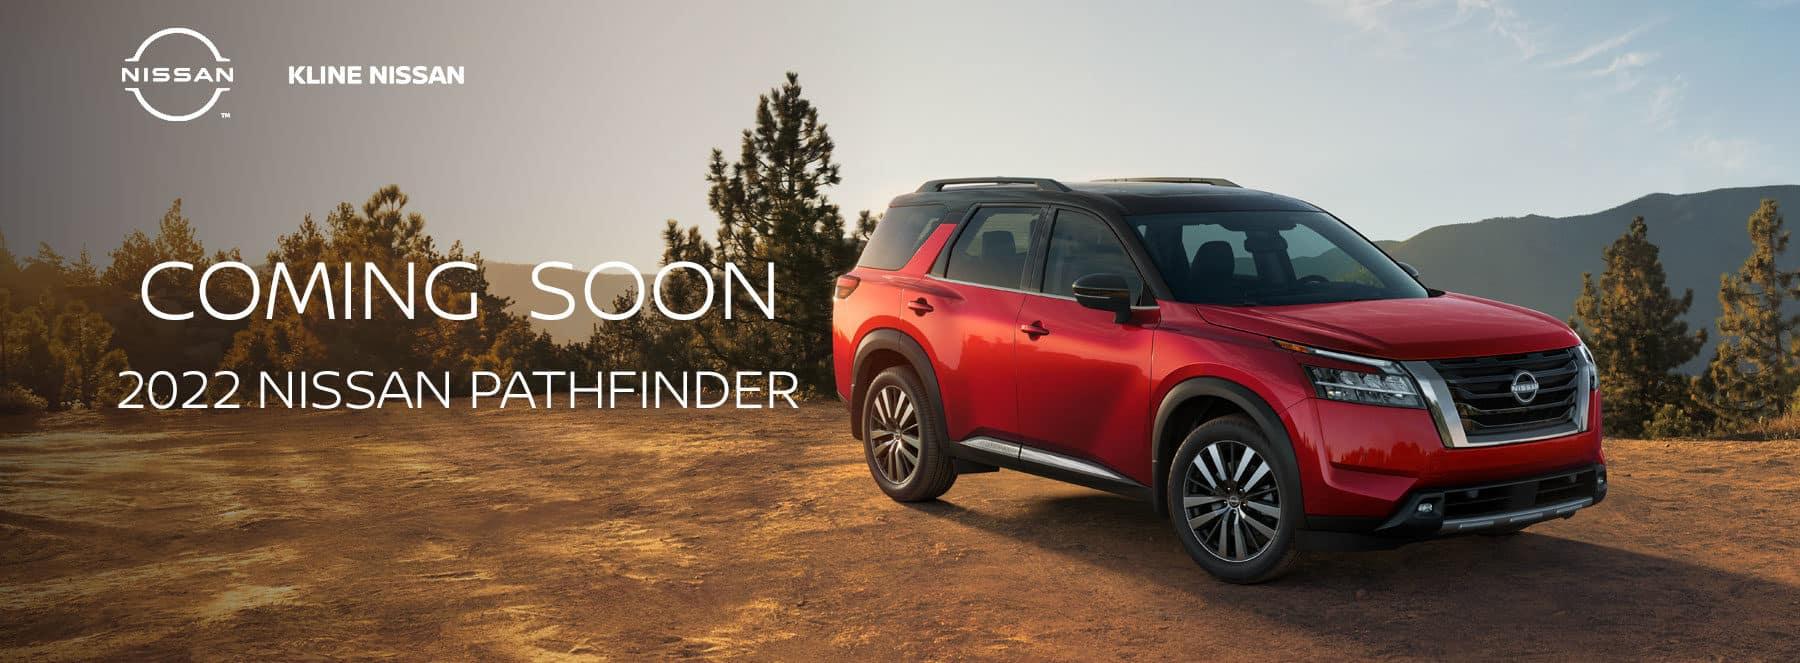 Coming Soon, 2022 Nissan Pathfinder